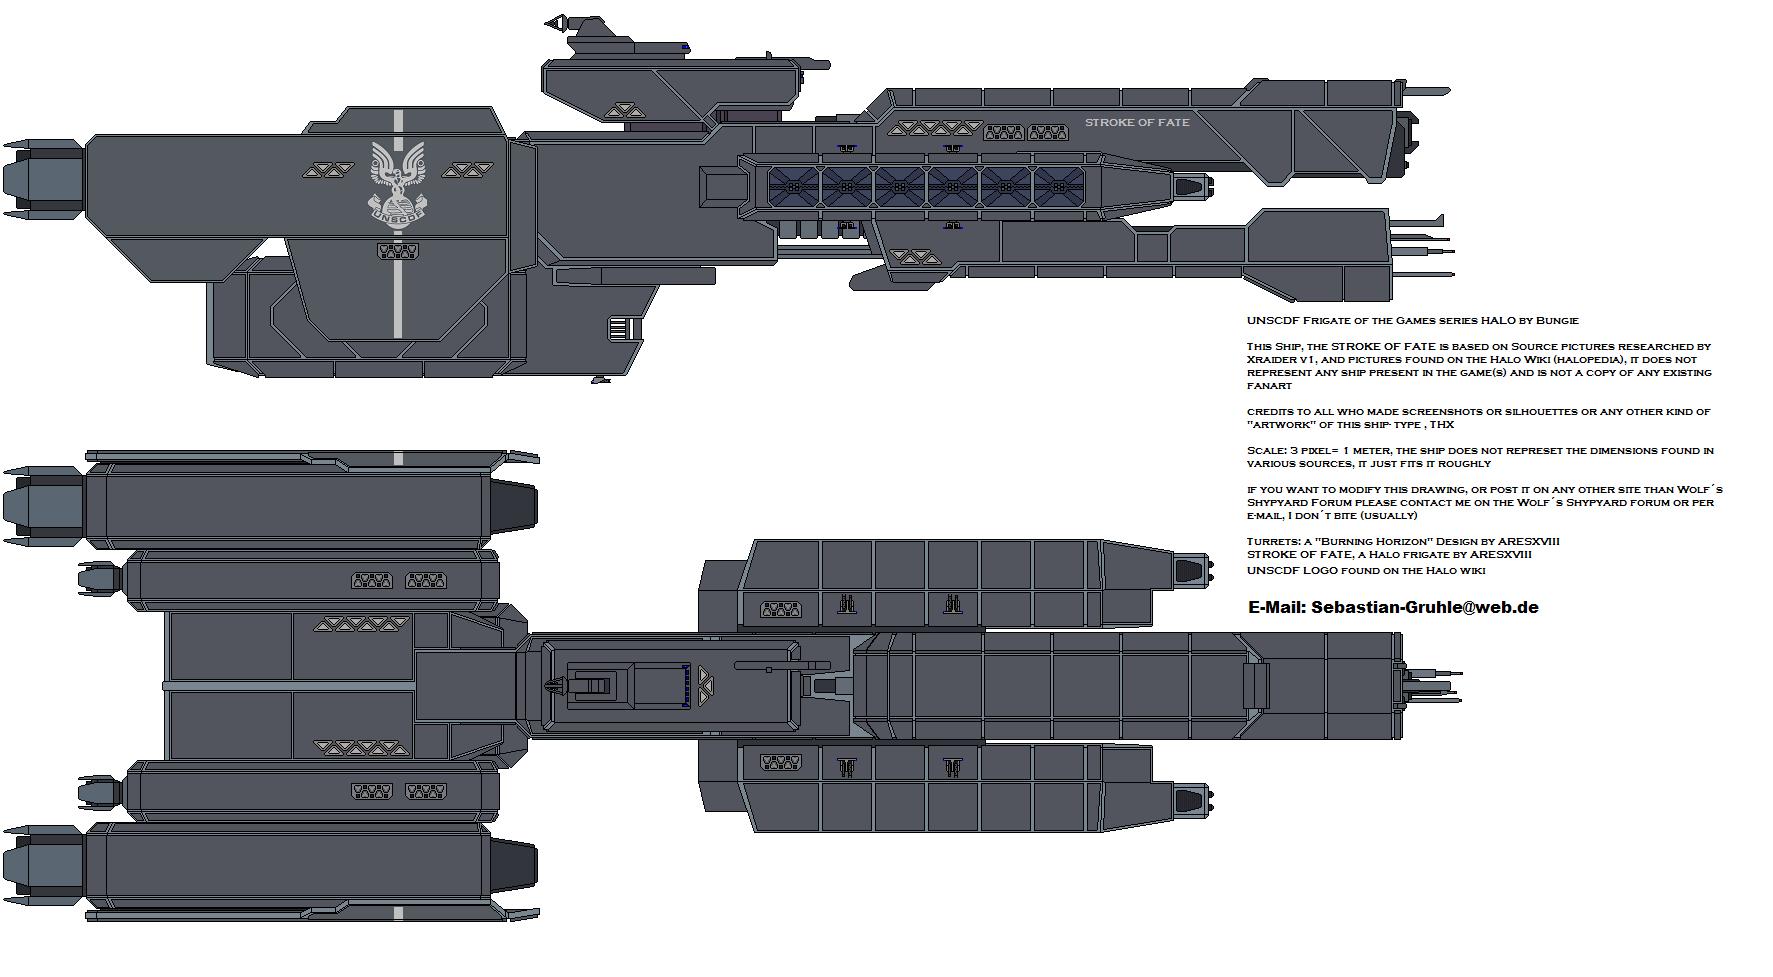 Halo 5 UNSC Frigate Triton: Test Render by calamitySi on DeviantArt